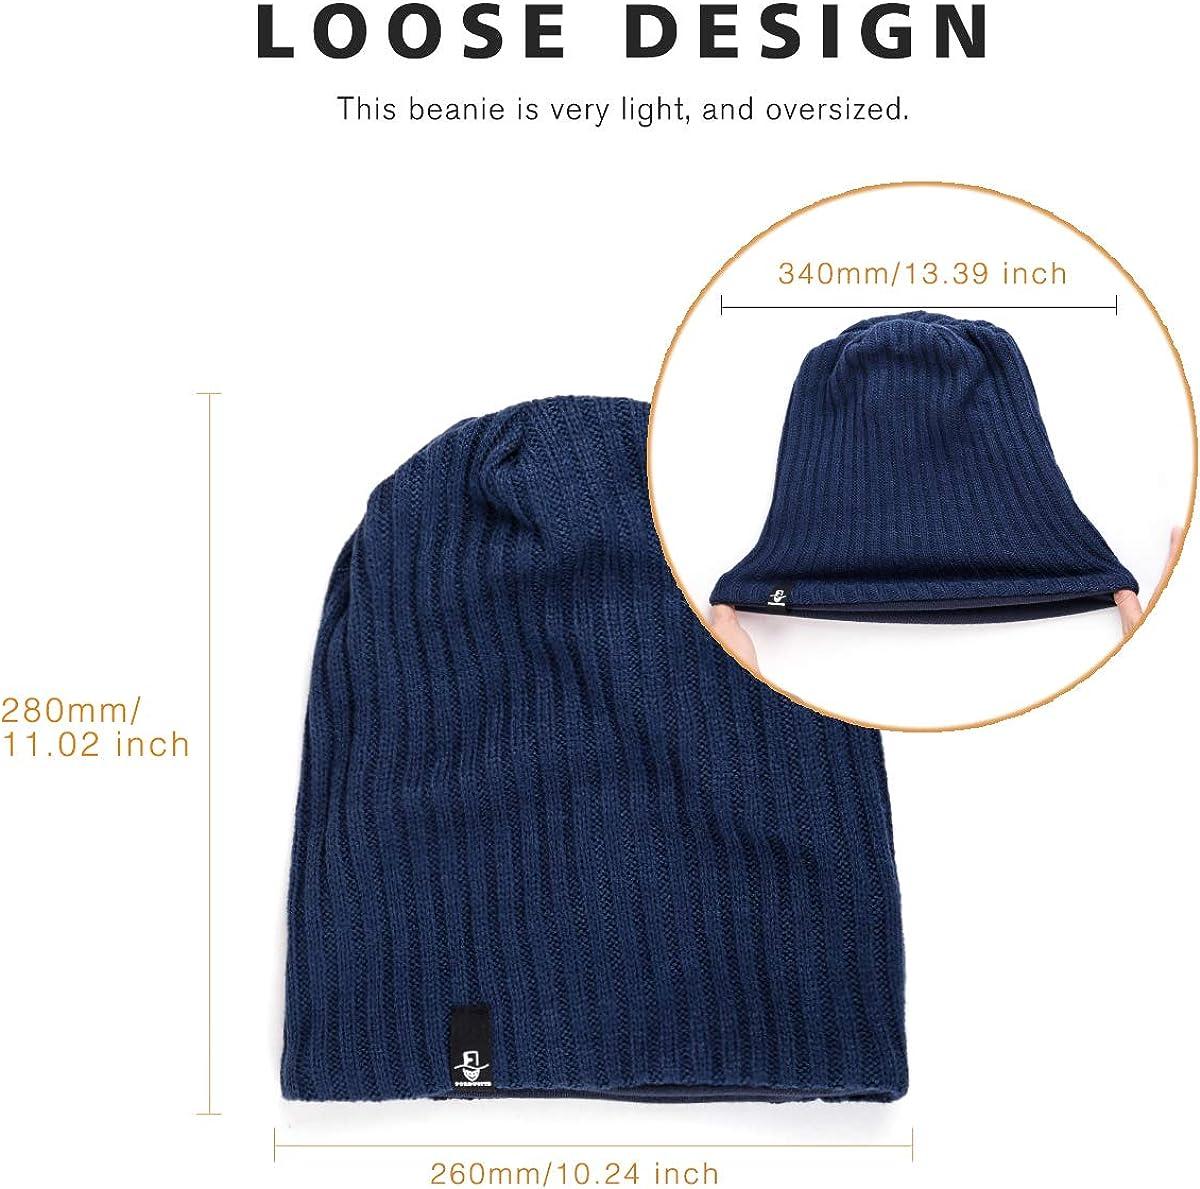 Mens Oversize Slouch Beanie Skull Cap Winter Warm Hat